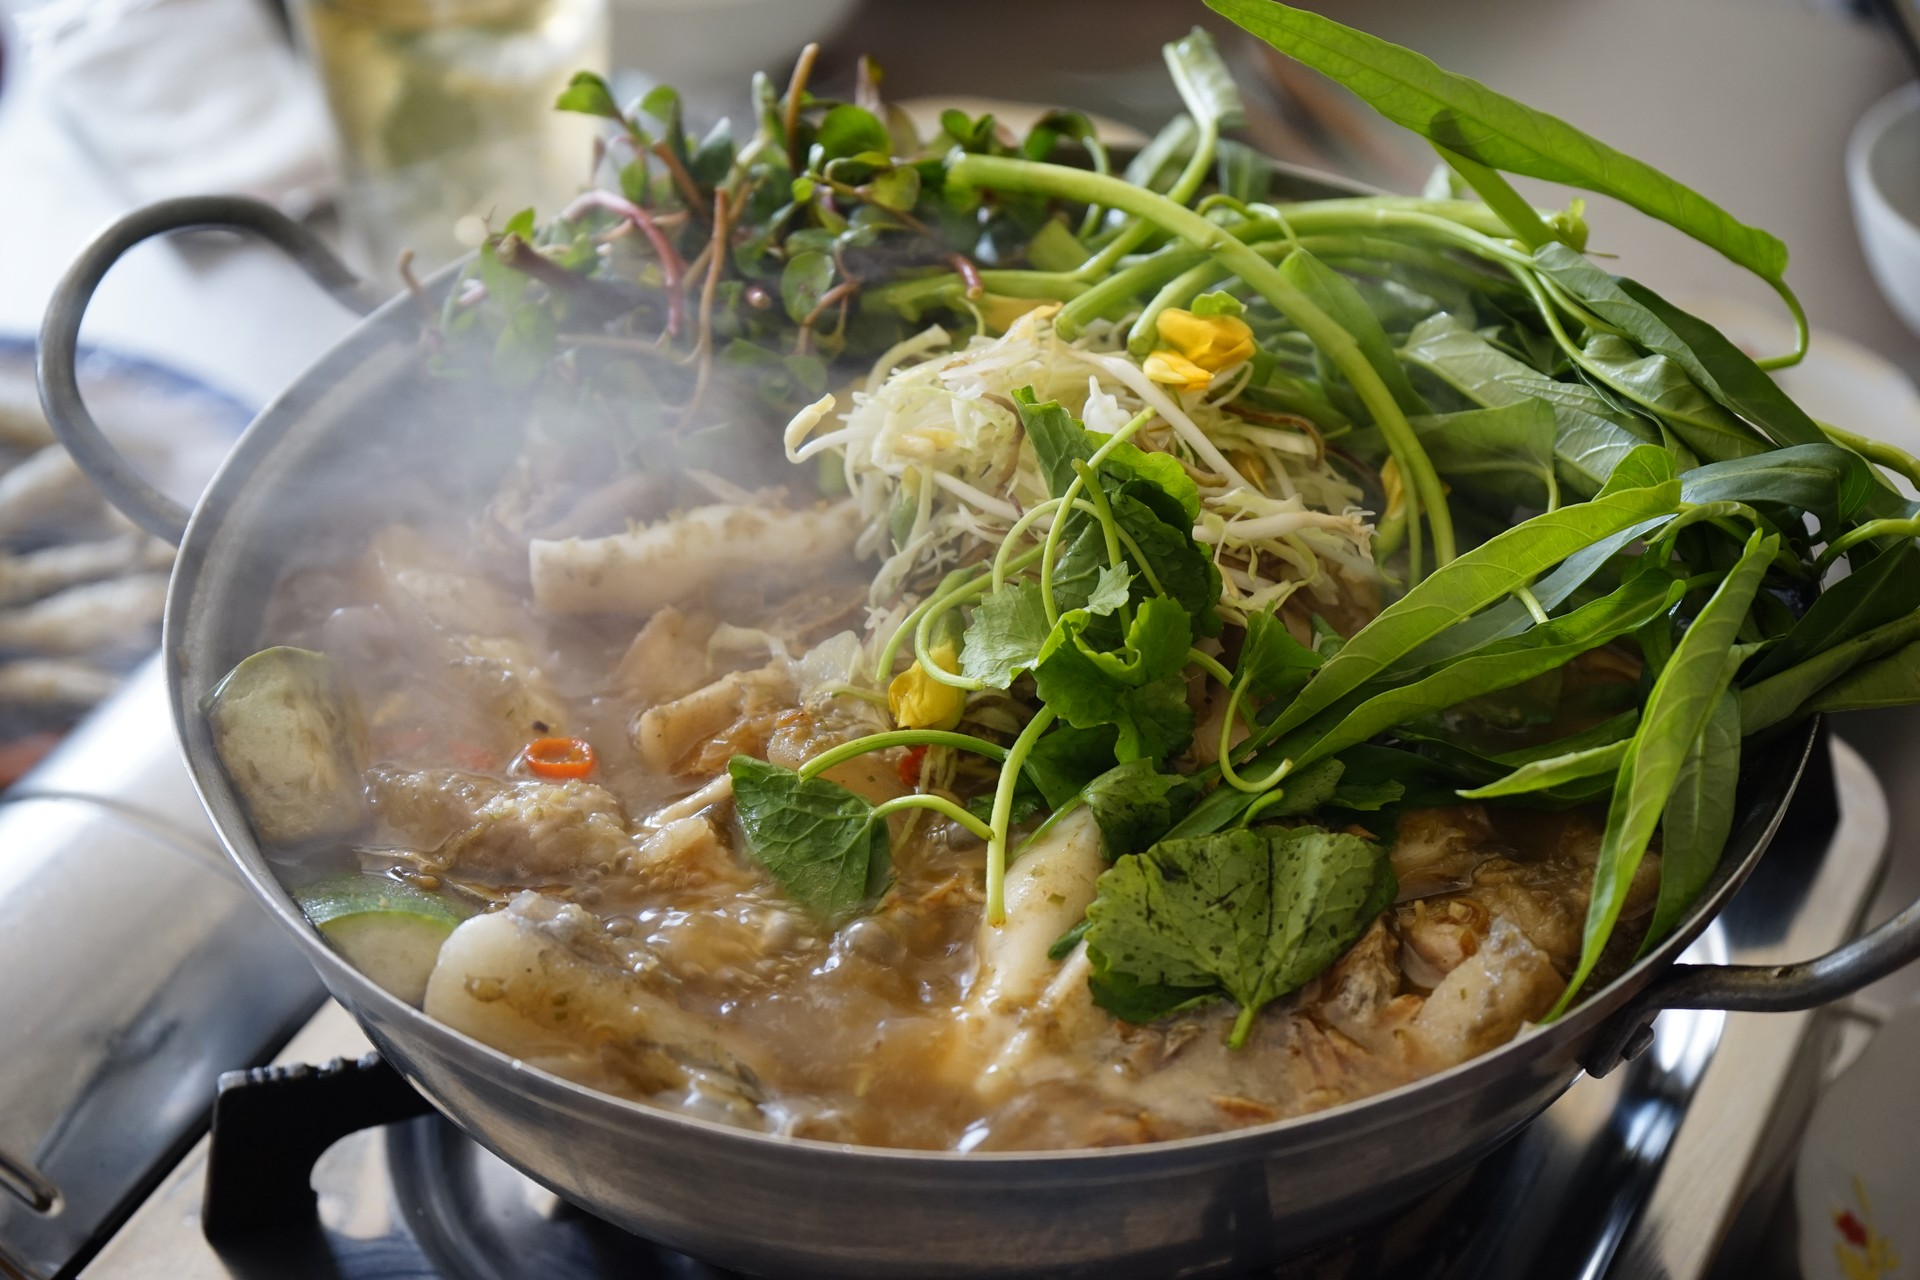 Lau mam - a fish hotpot cooked in Mekong Delta, Vietnam